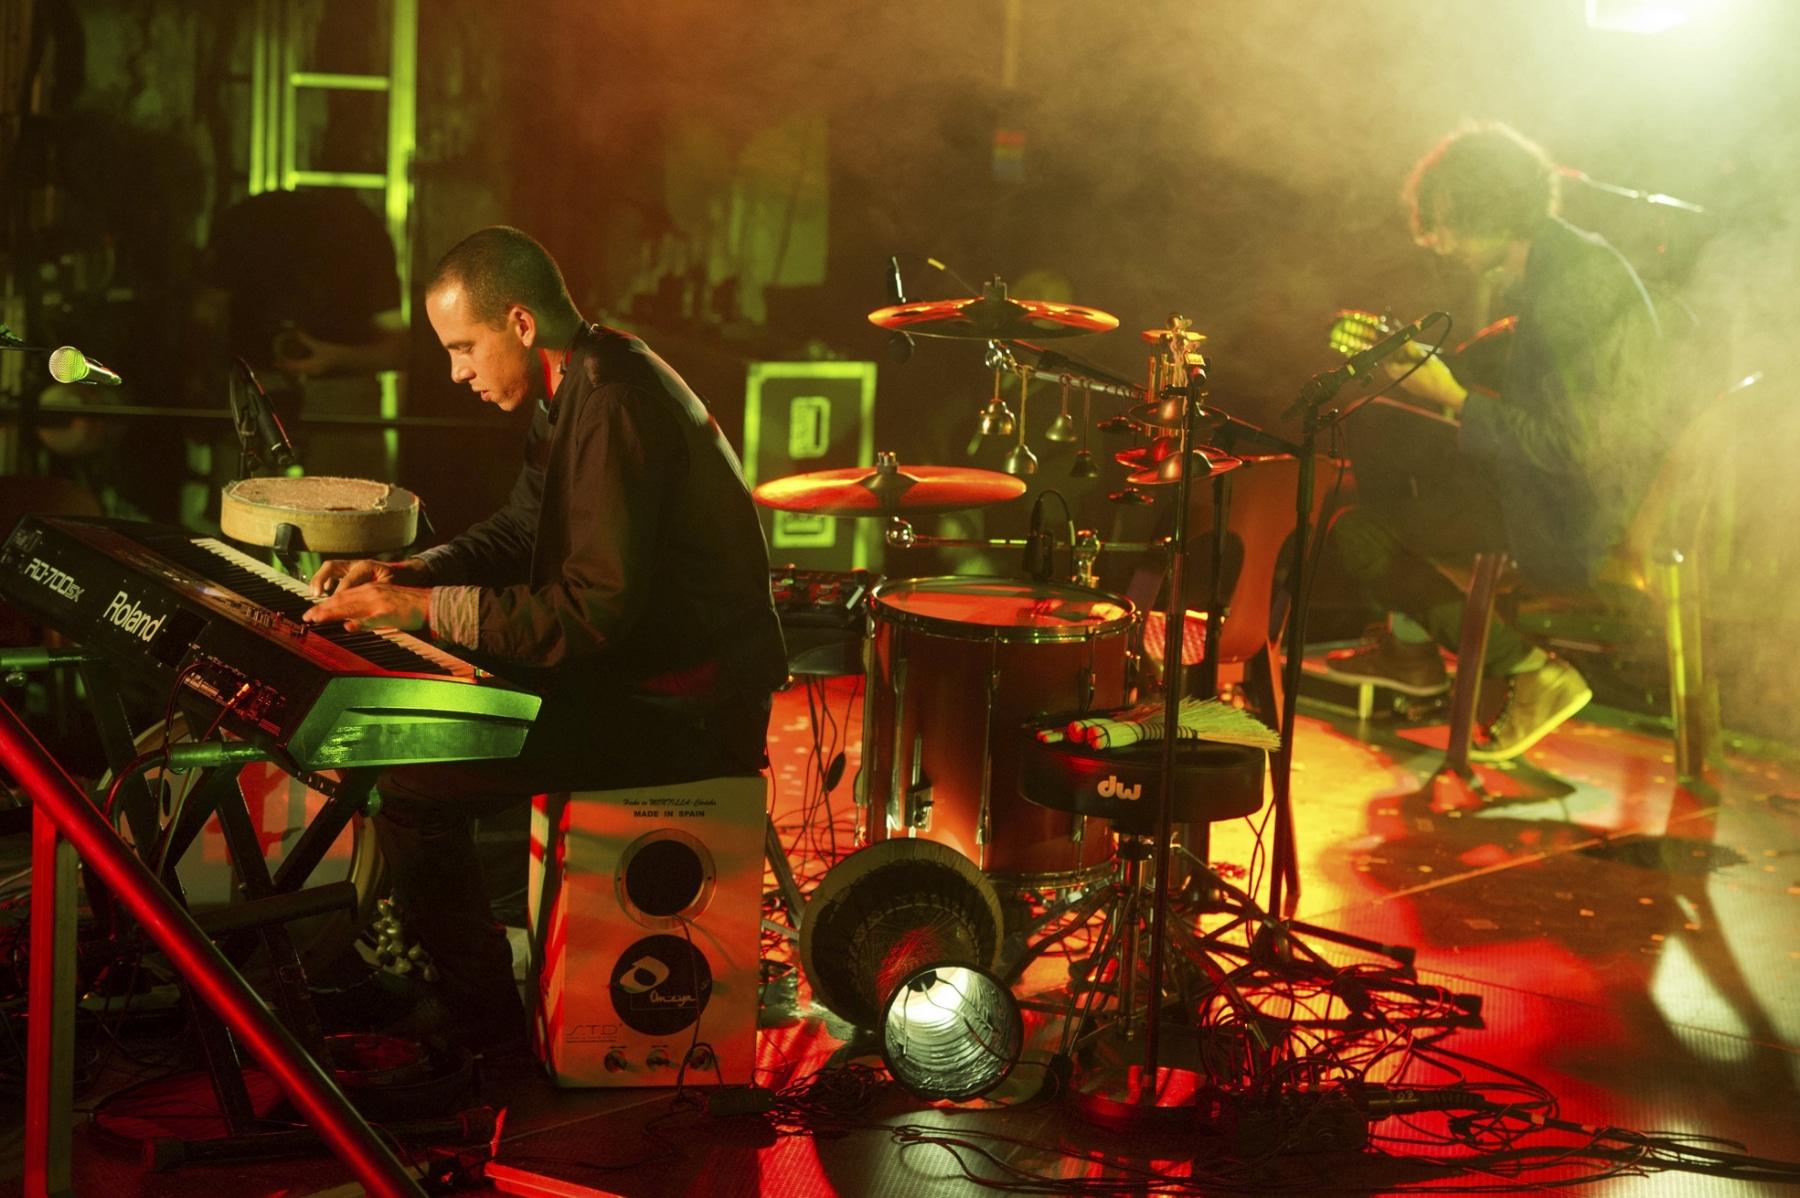 19-junio-gibraltar-world-music-festival22_14277912019_o